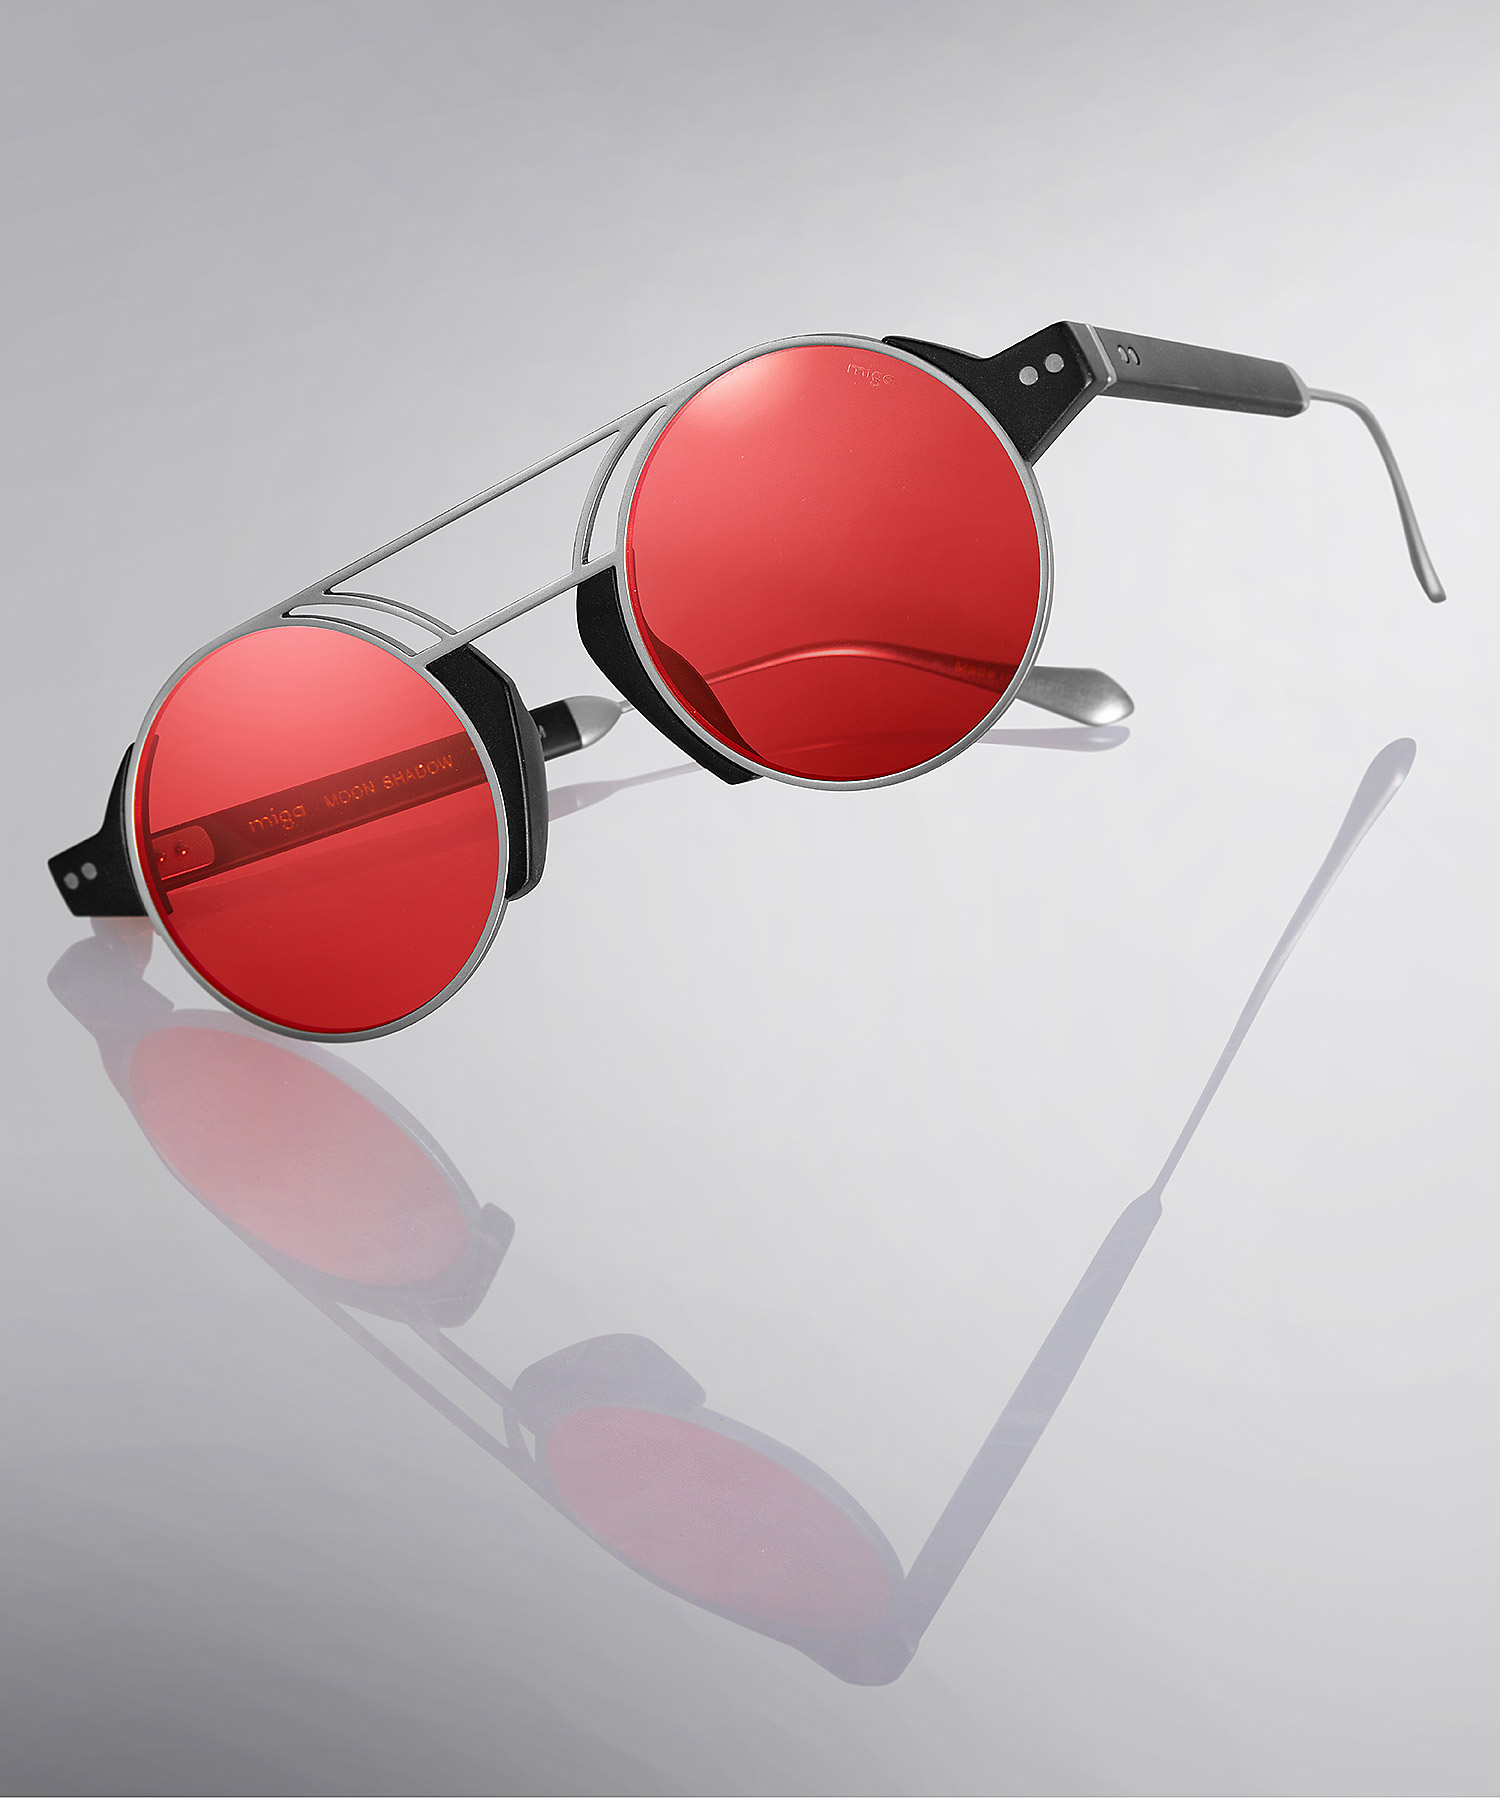 Social occhiali